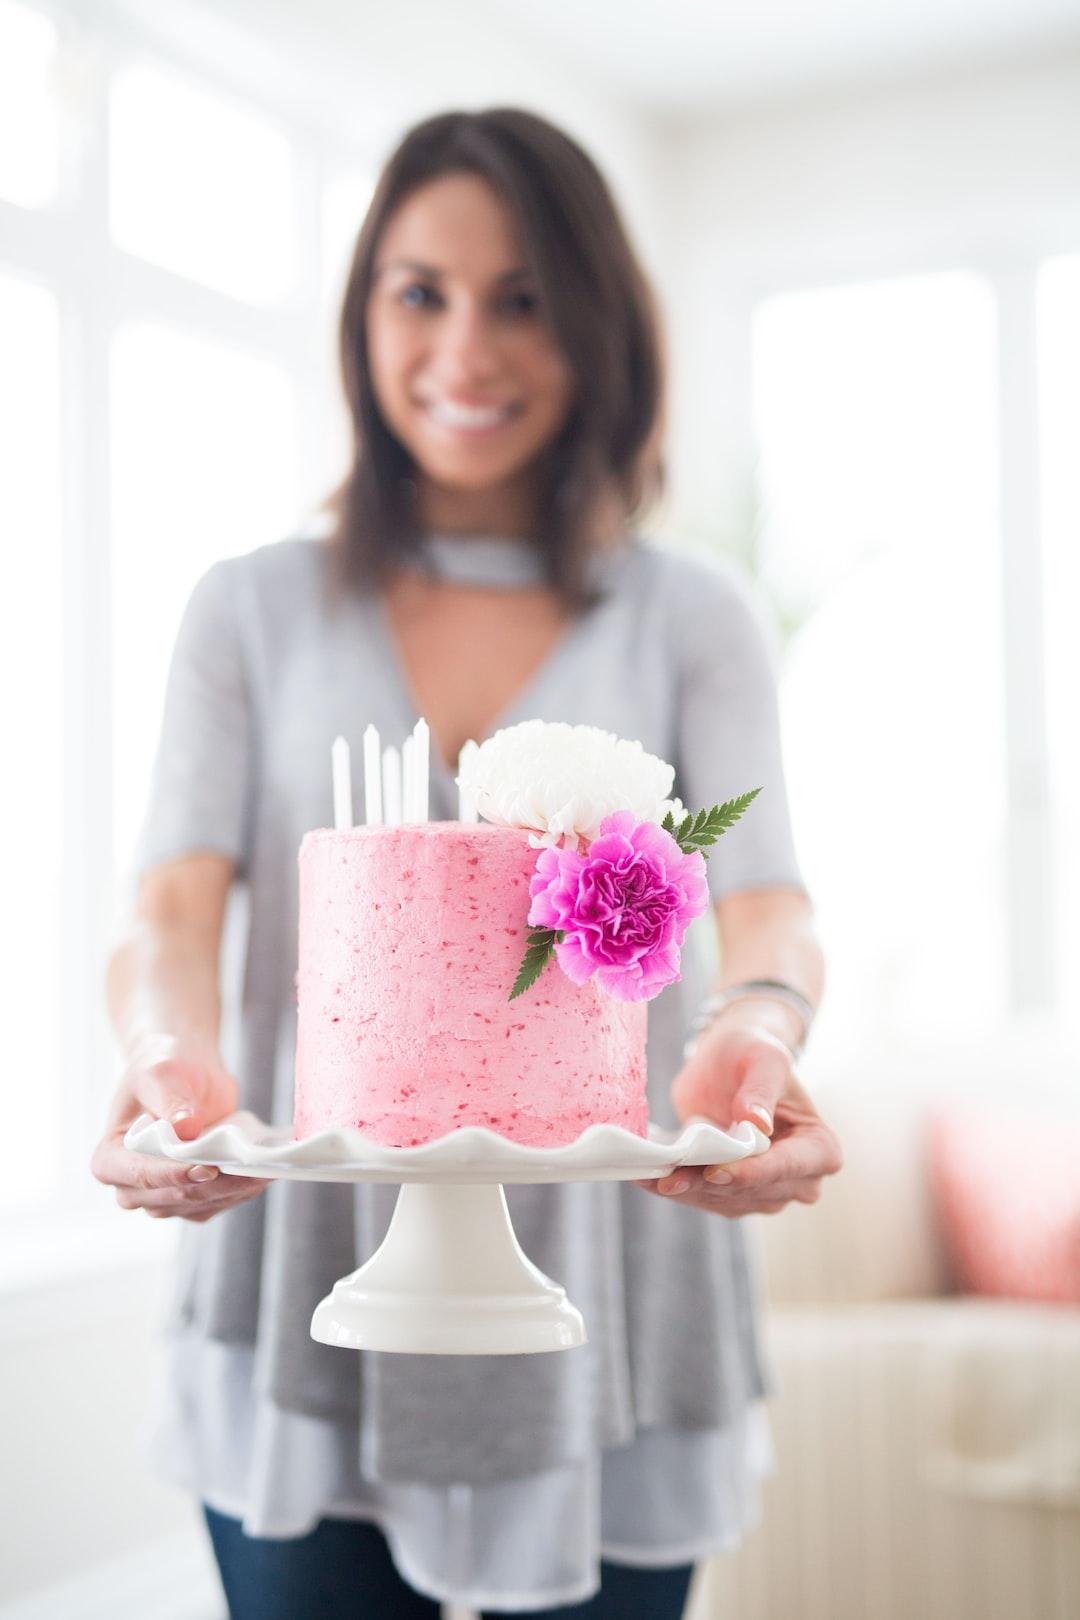 Holding the birthday cake